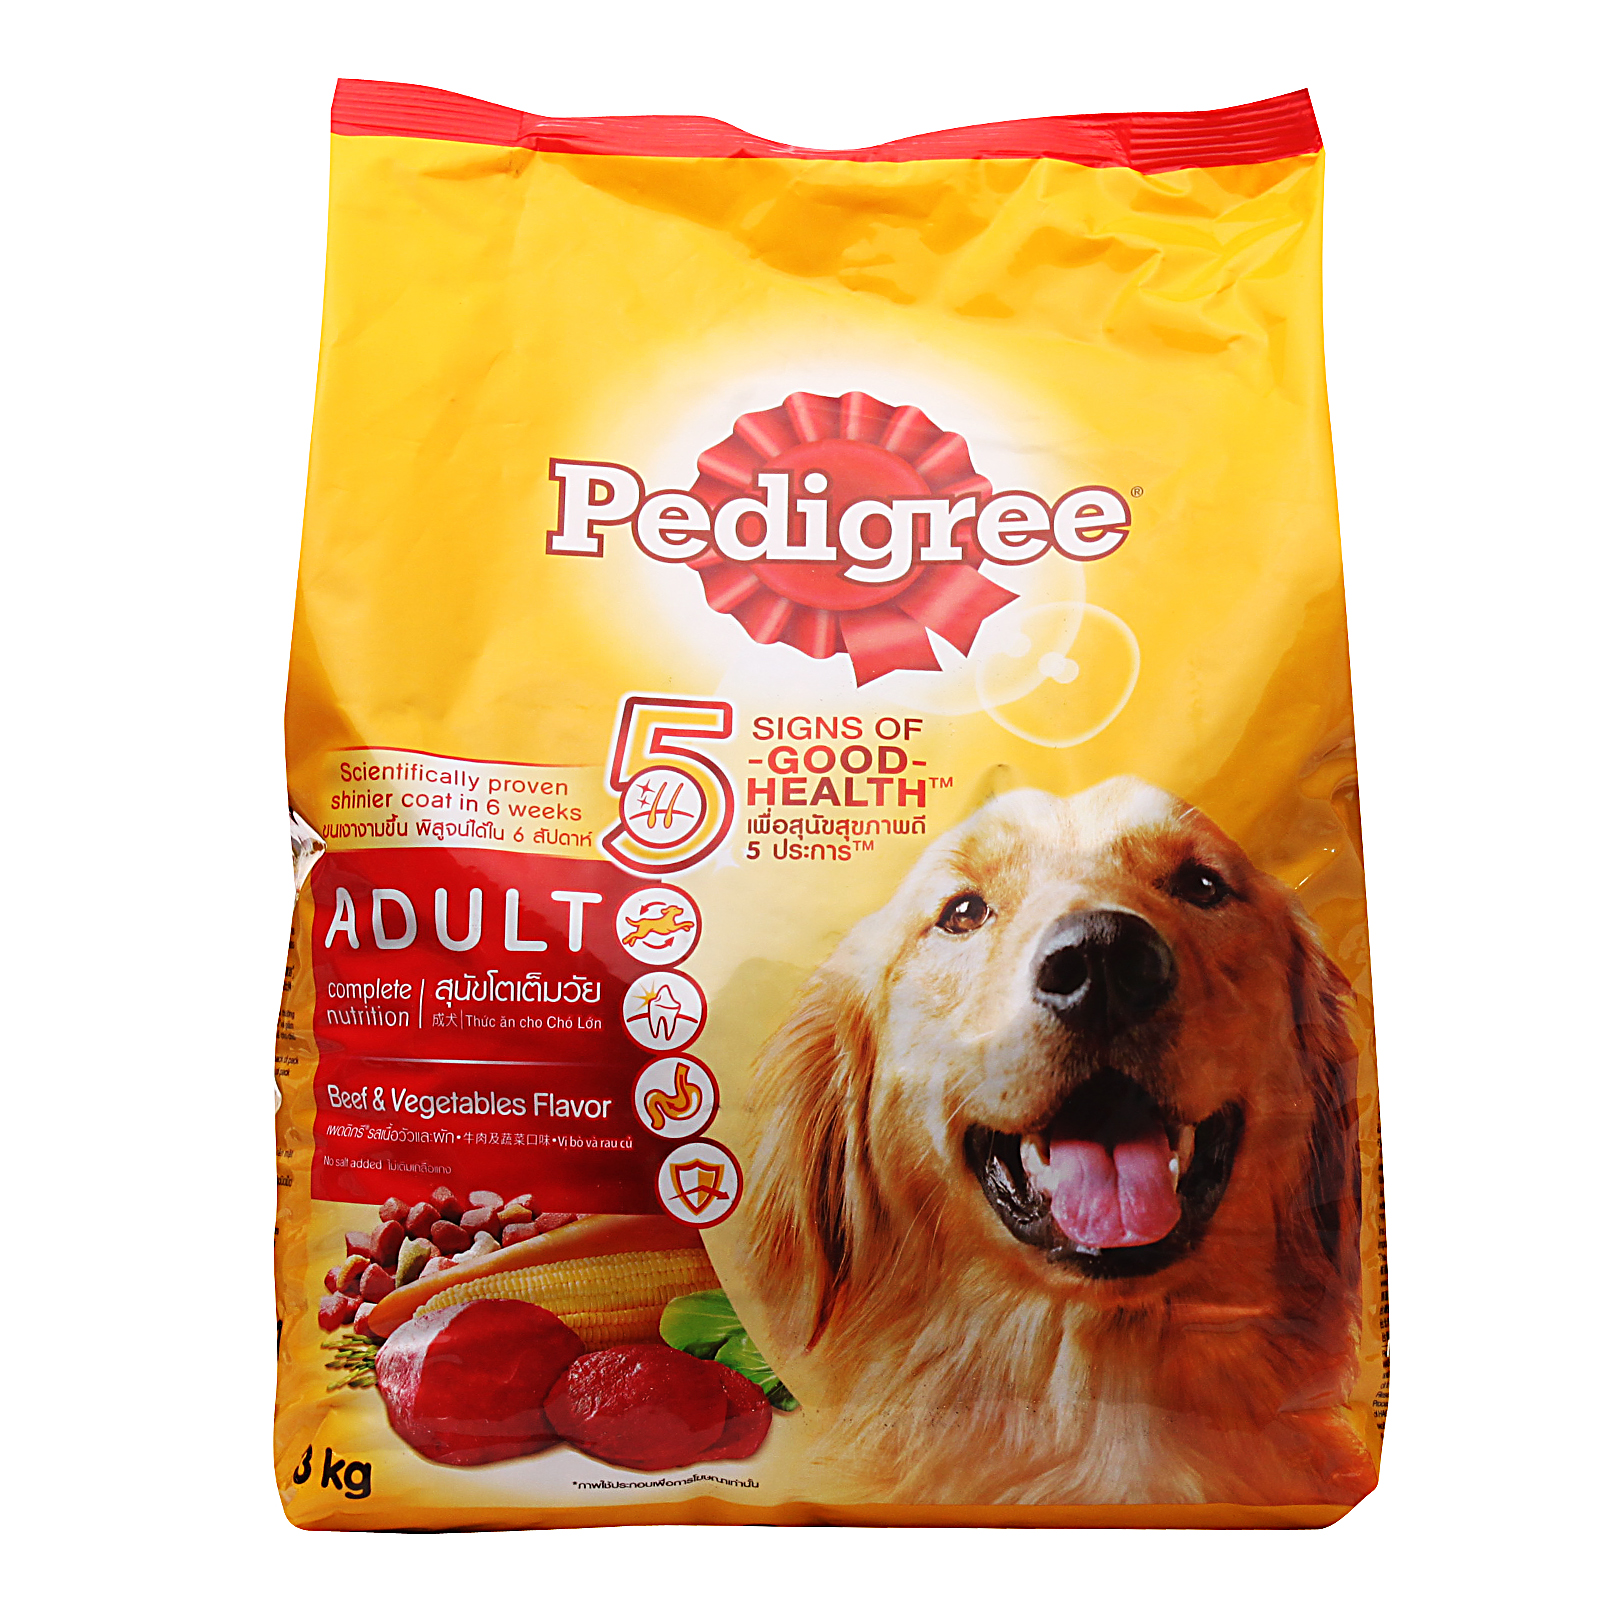 Pedigree Dog Food Beef & Vegetable - Pet Food - Pet Store - Pet supplies